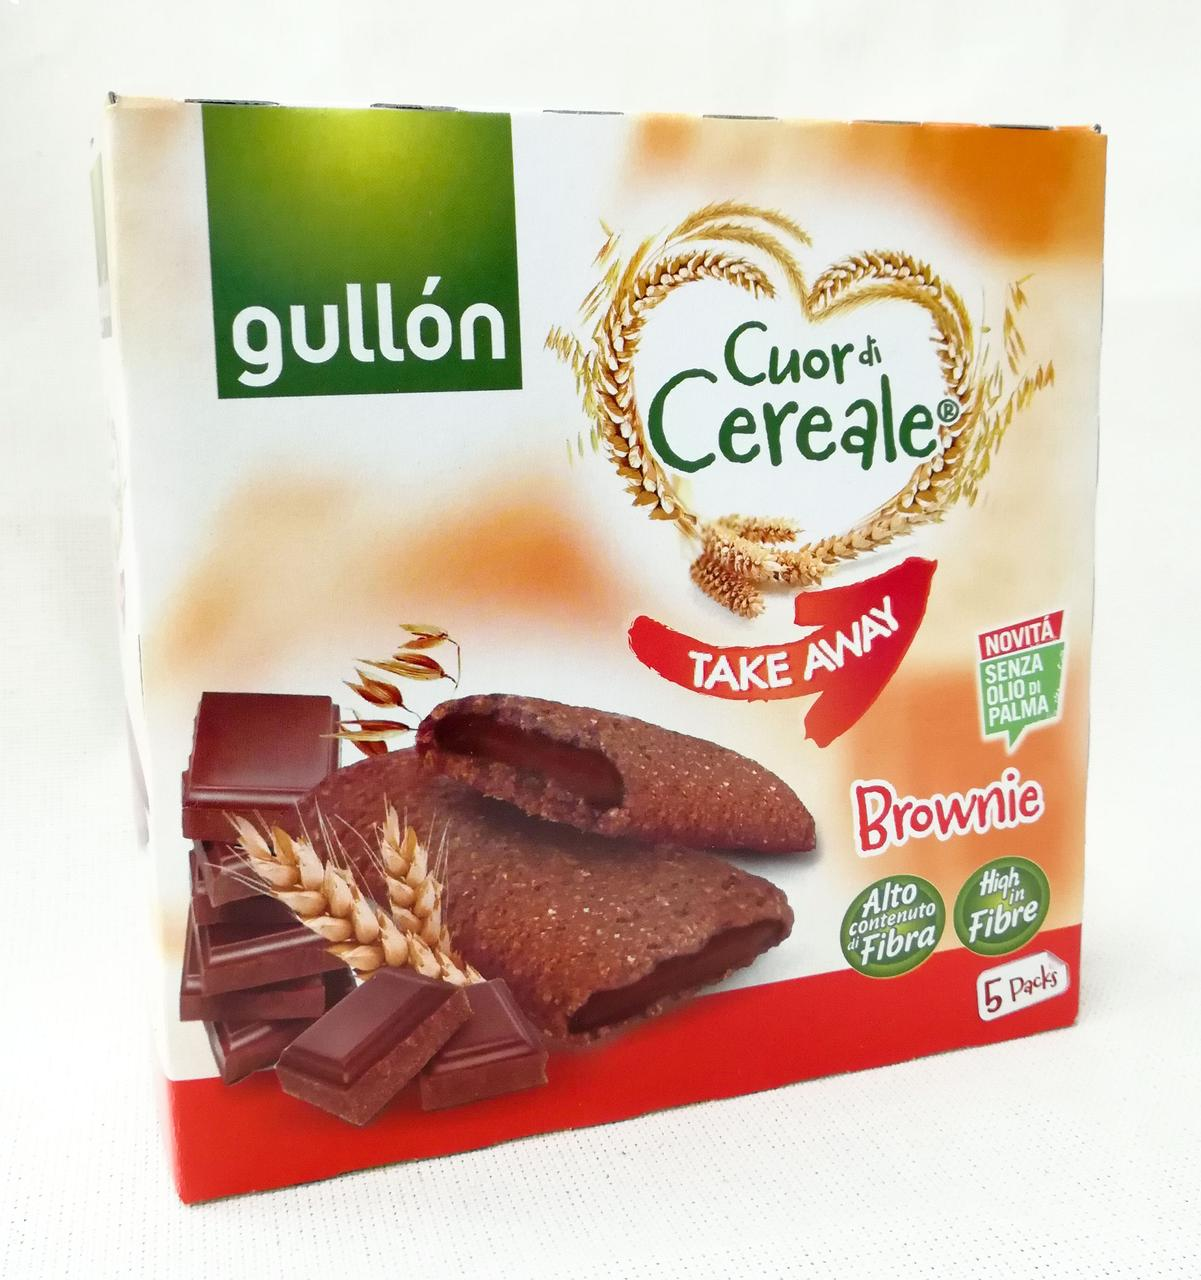 Gullon Cuor di Cereale Take Away Brownie